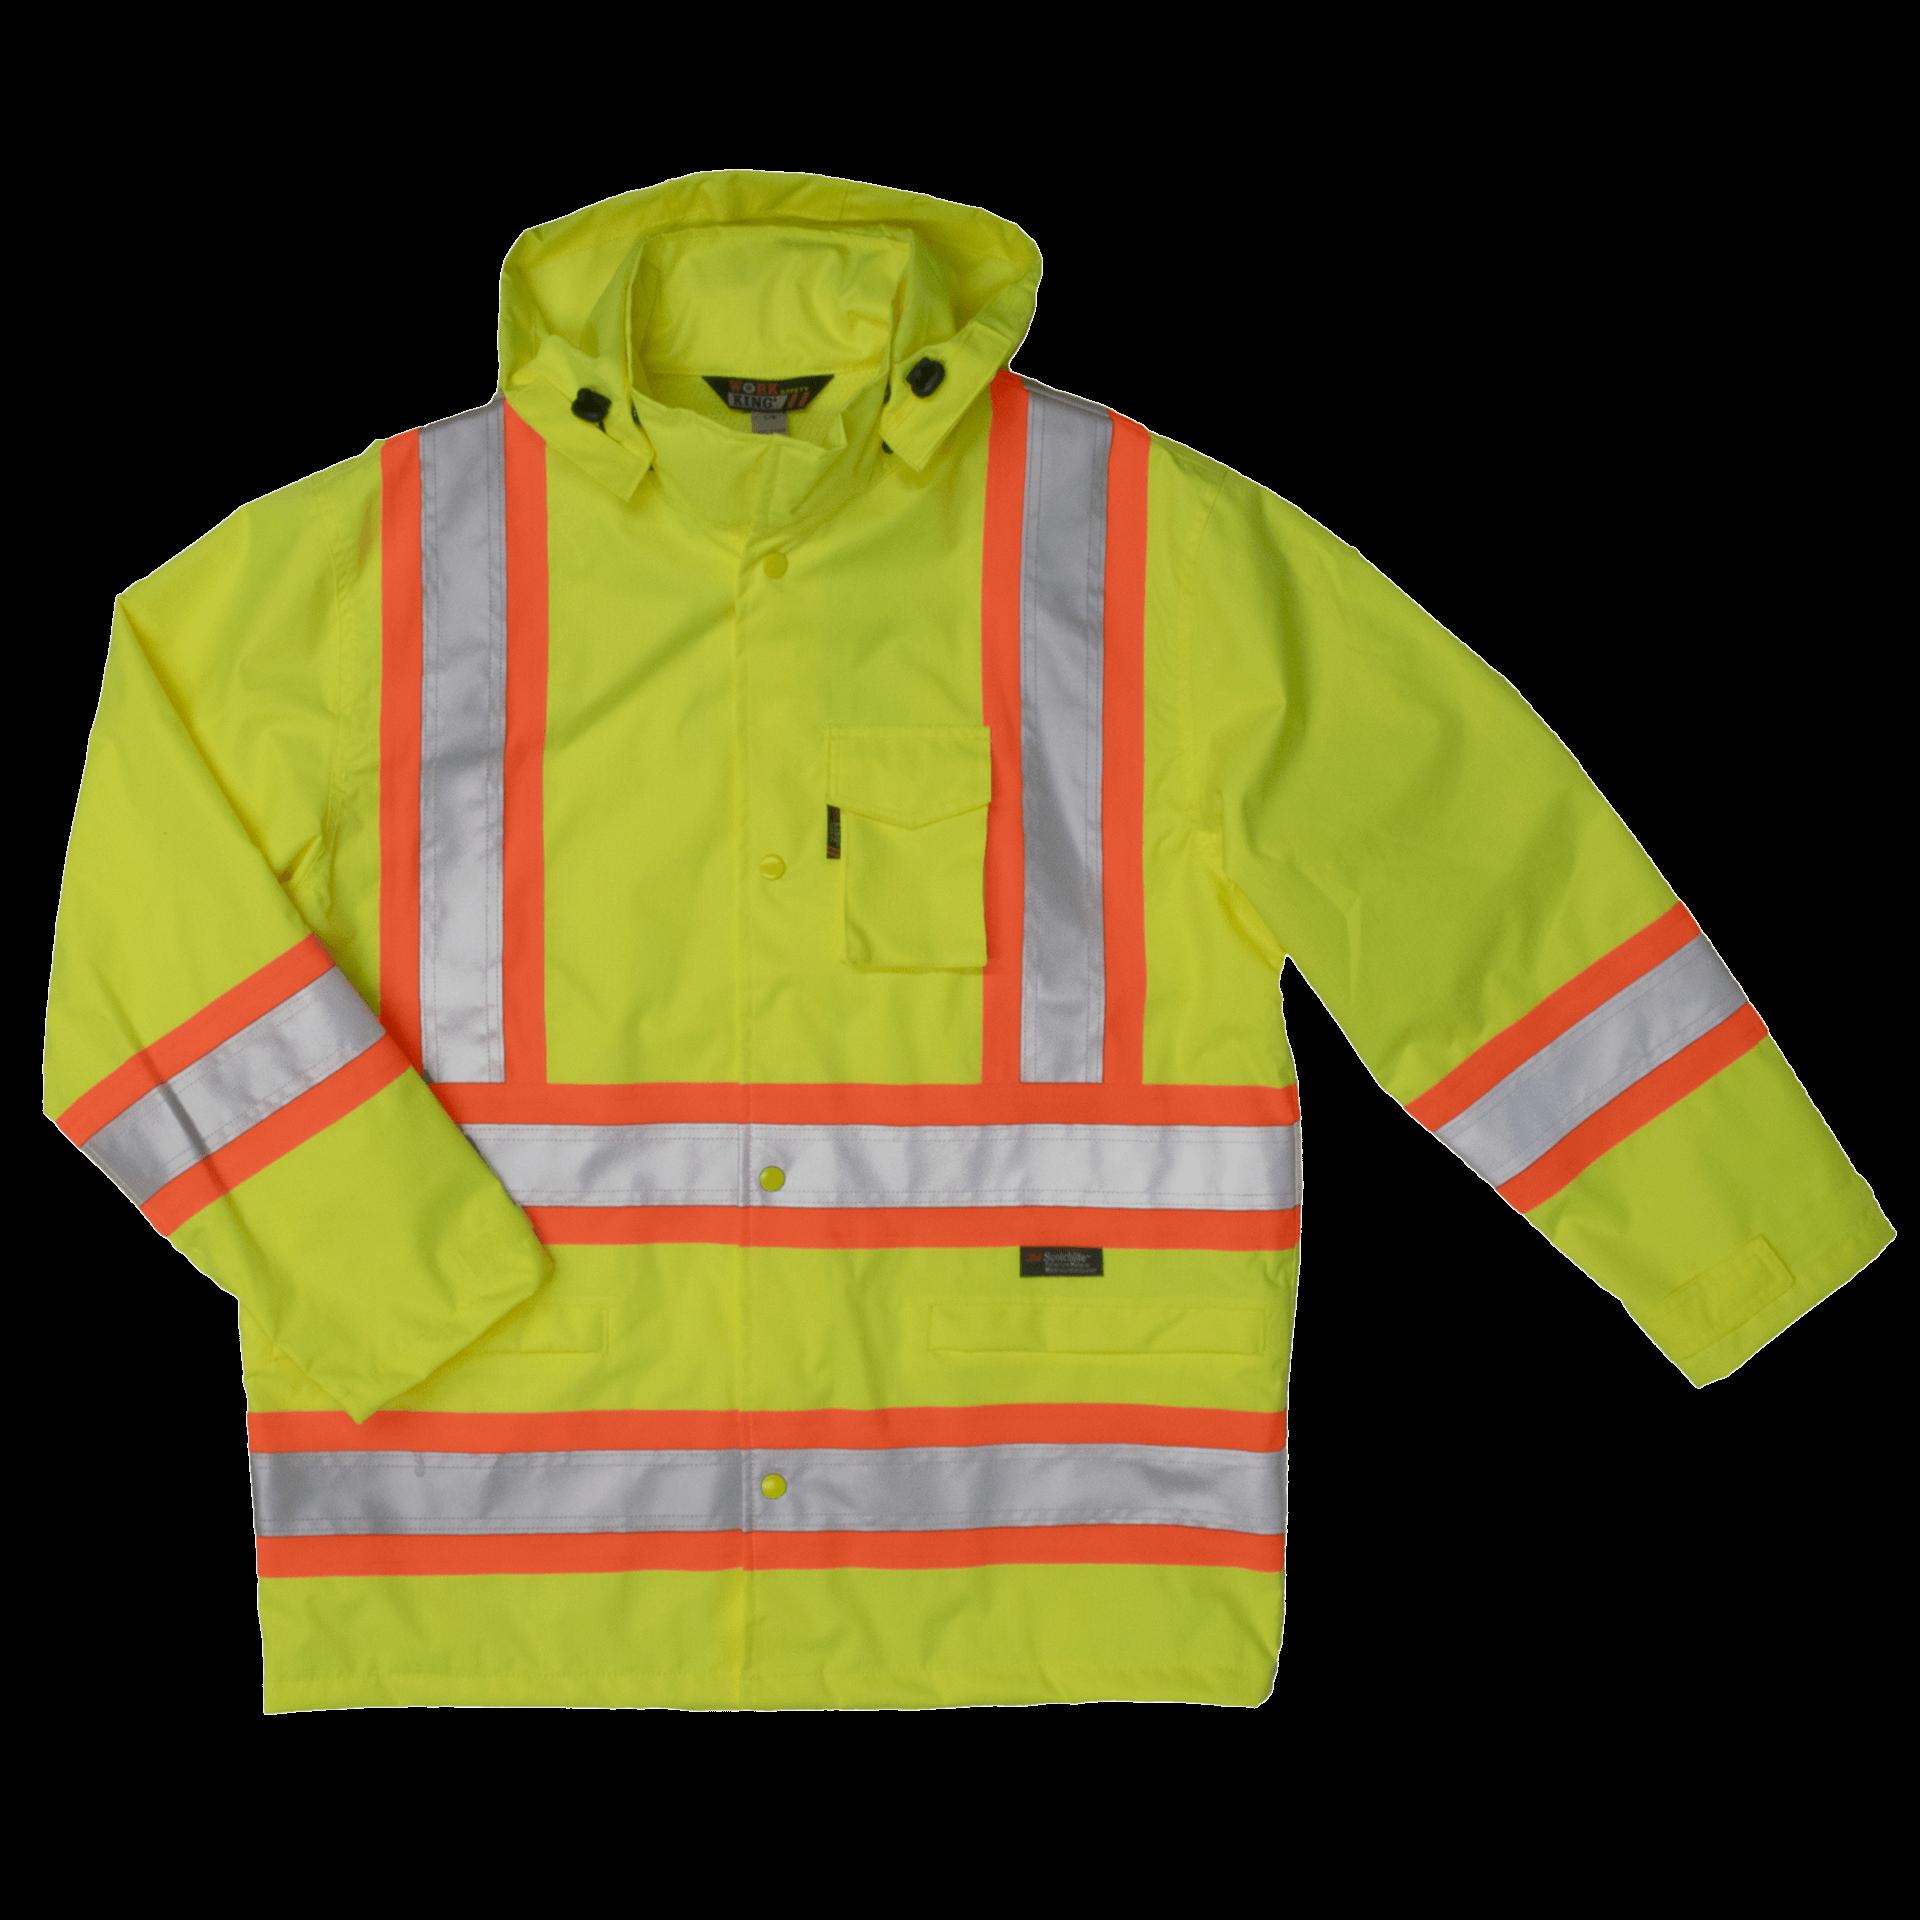 High Visibility Tough Duck Safety Rain Jacket S372